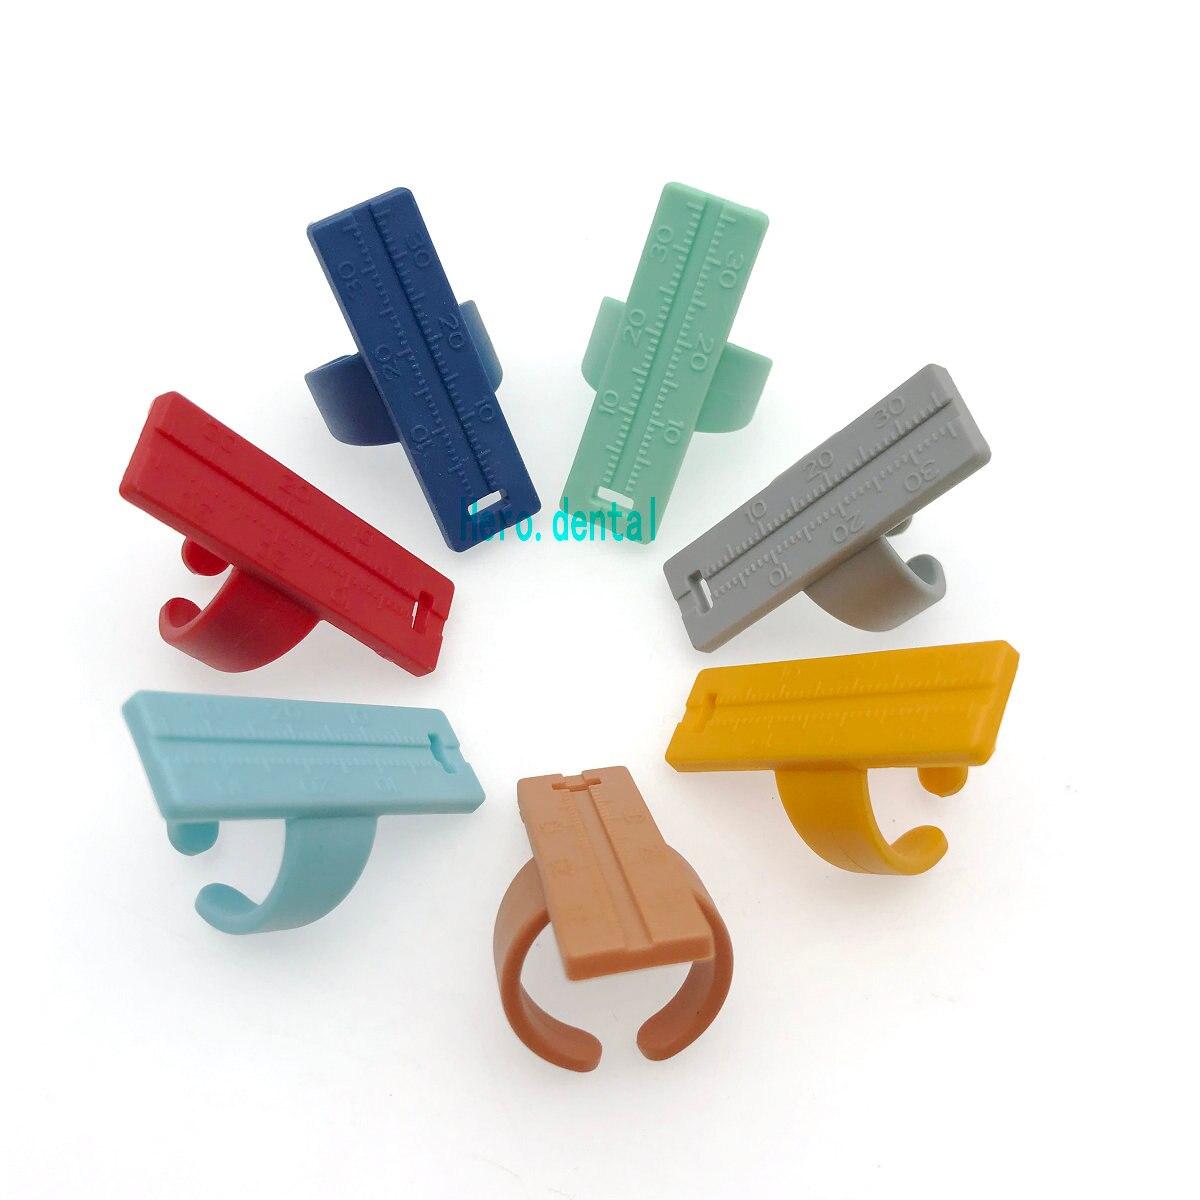 1pc dental raiz canal agulha dedo régua endo medida escala endodontic instrumento endo caixa